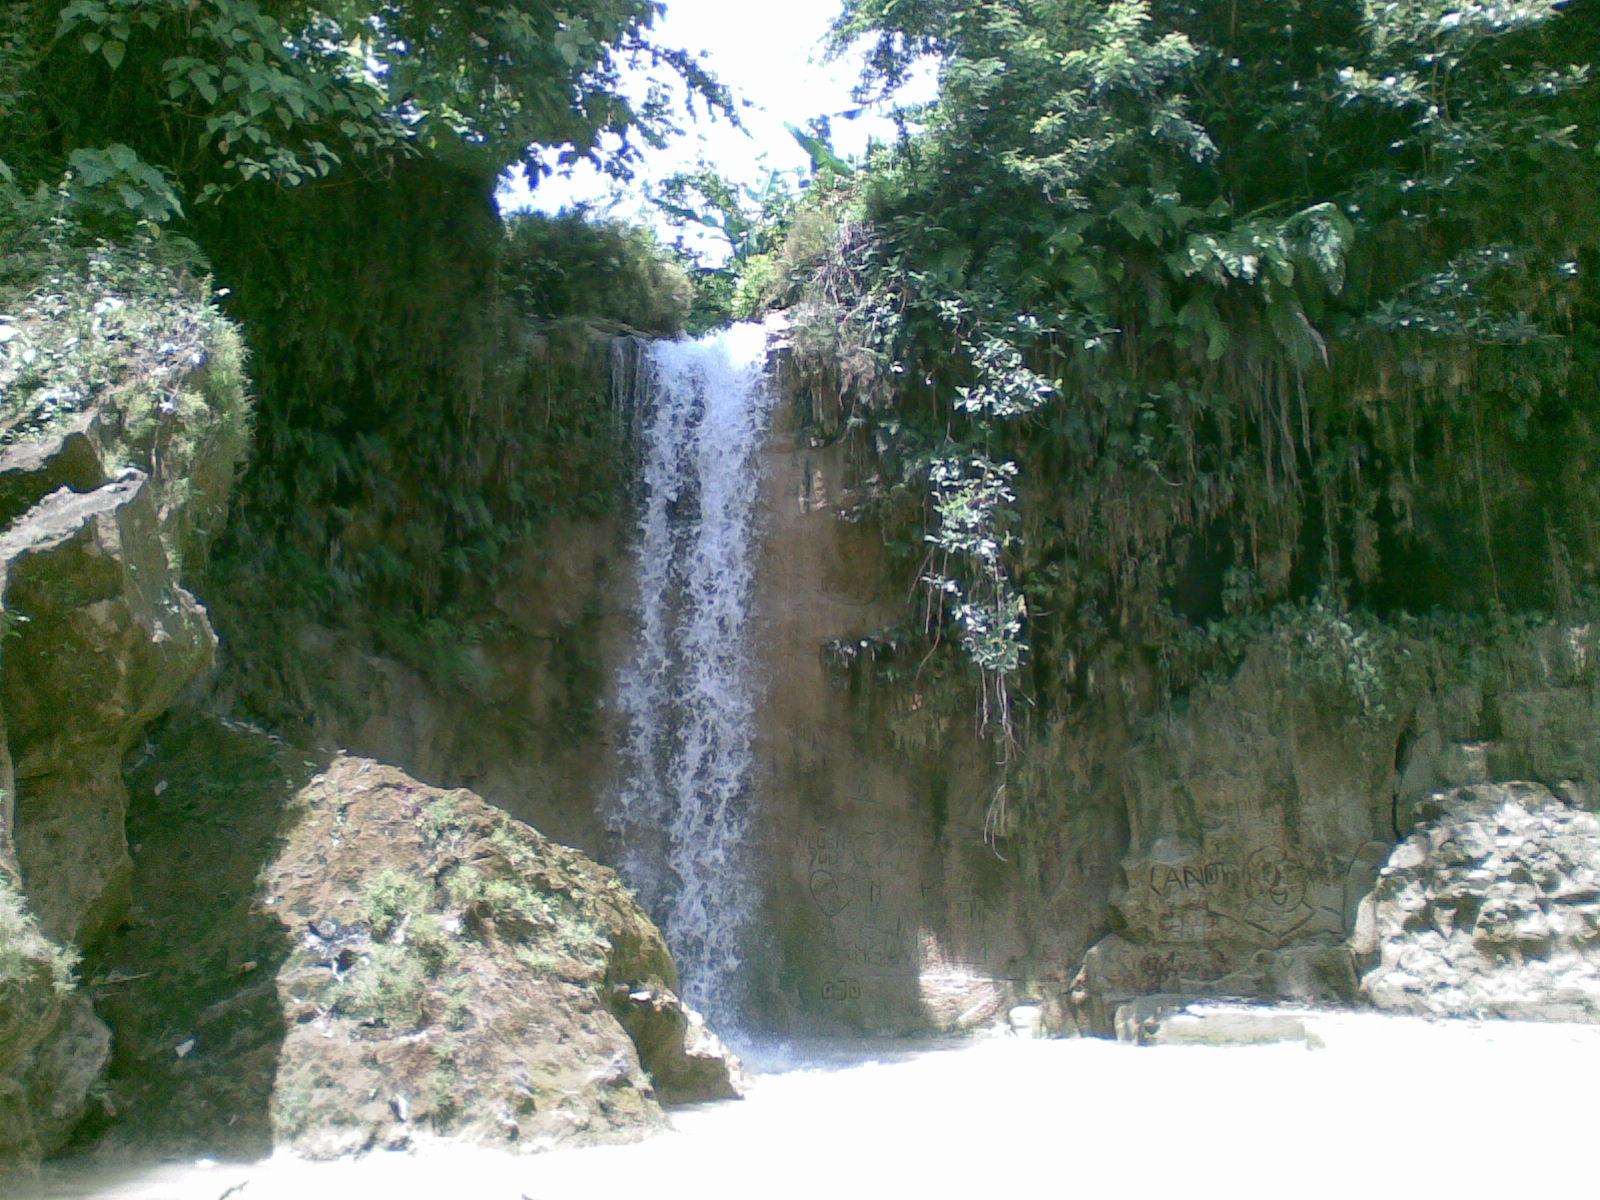 Tempat Wisata Blora Obyek Kabupaten Monumen Hutan Jati Alam Kab